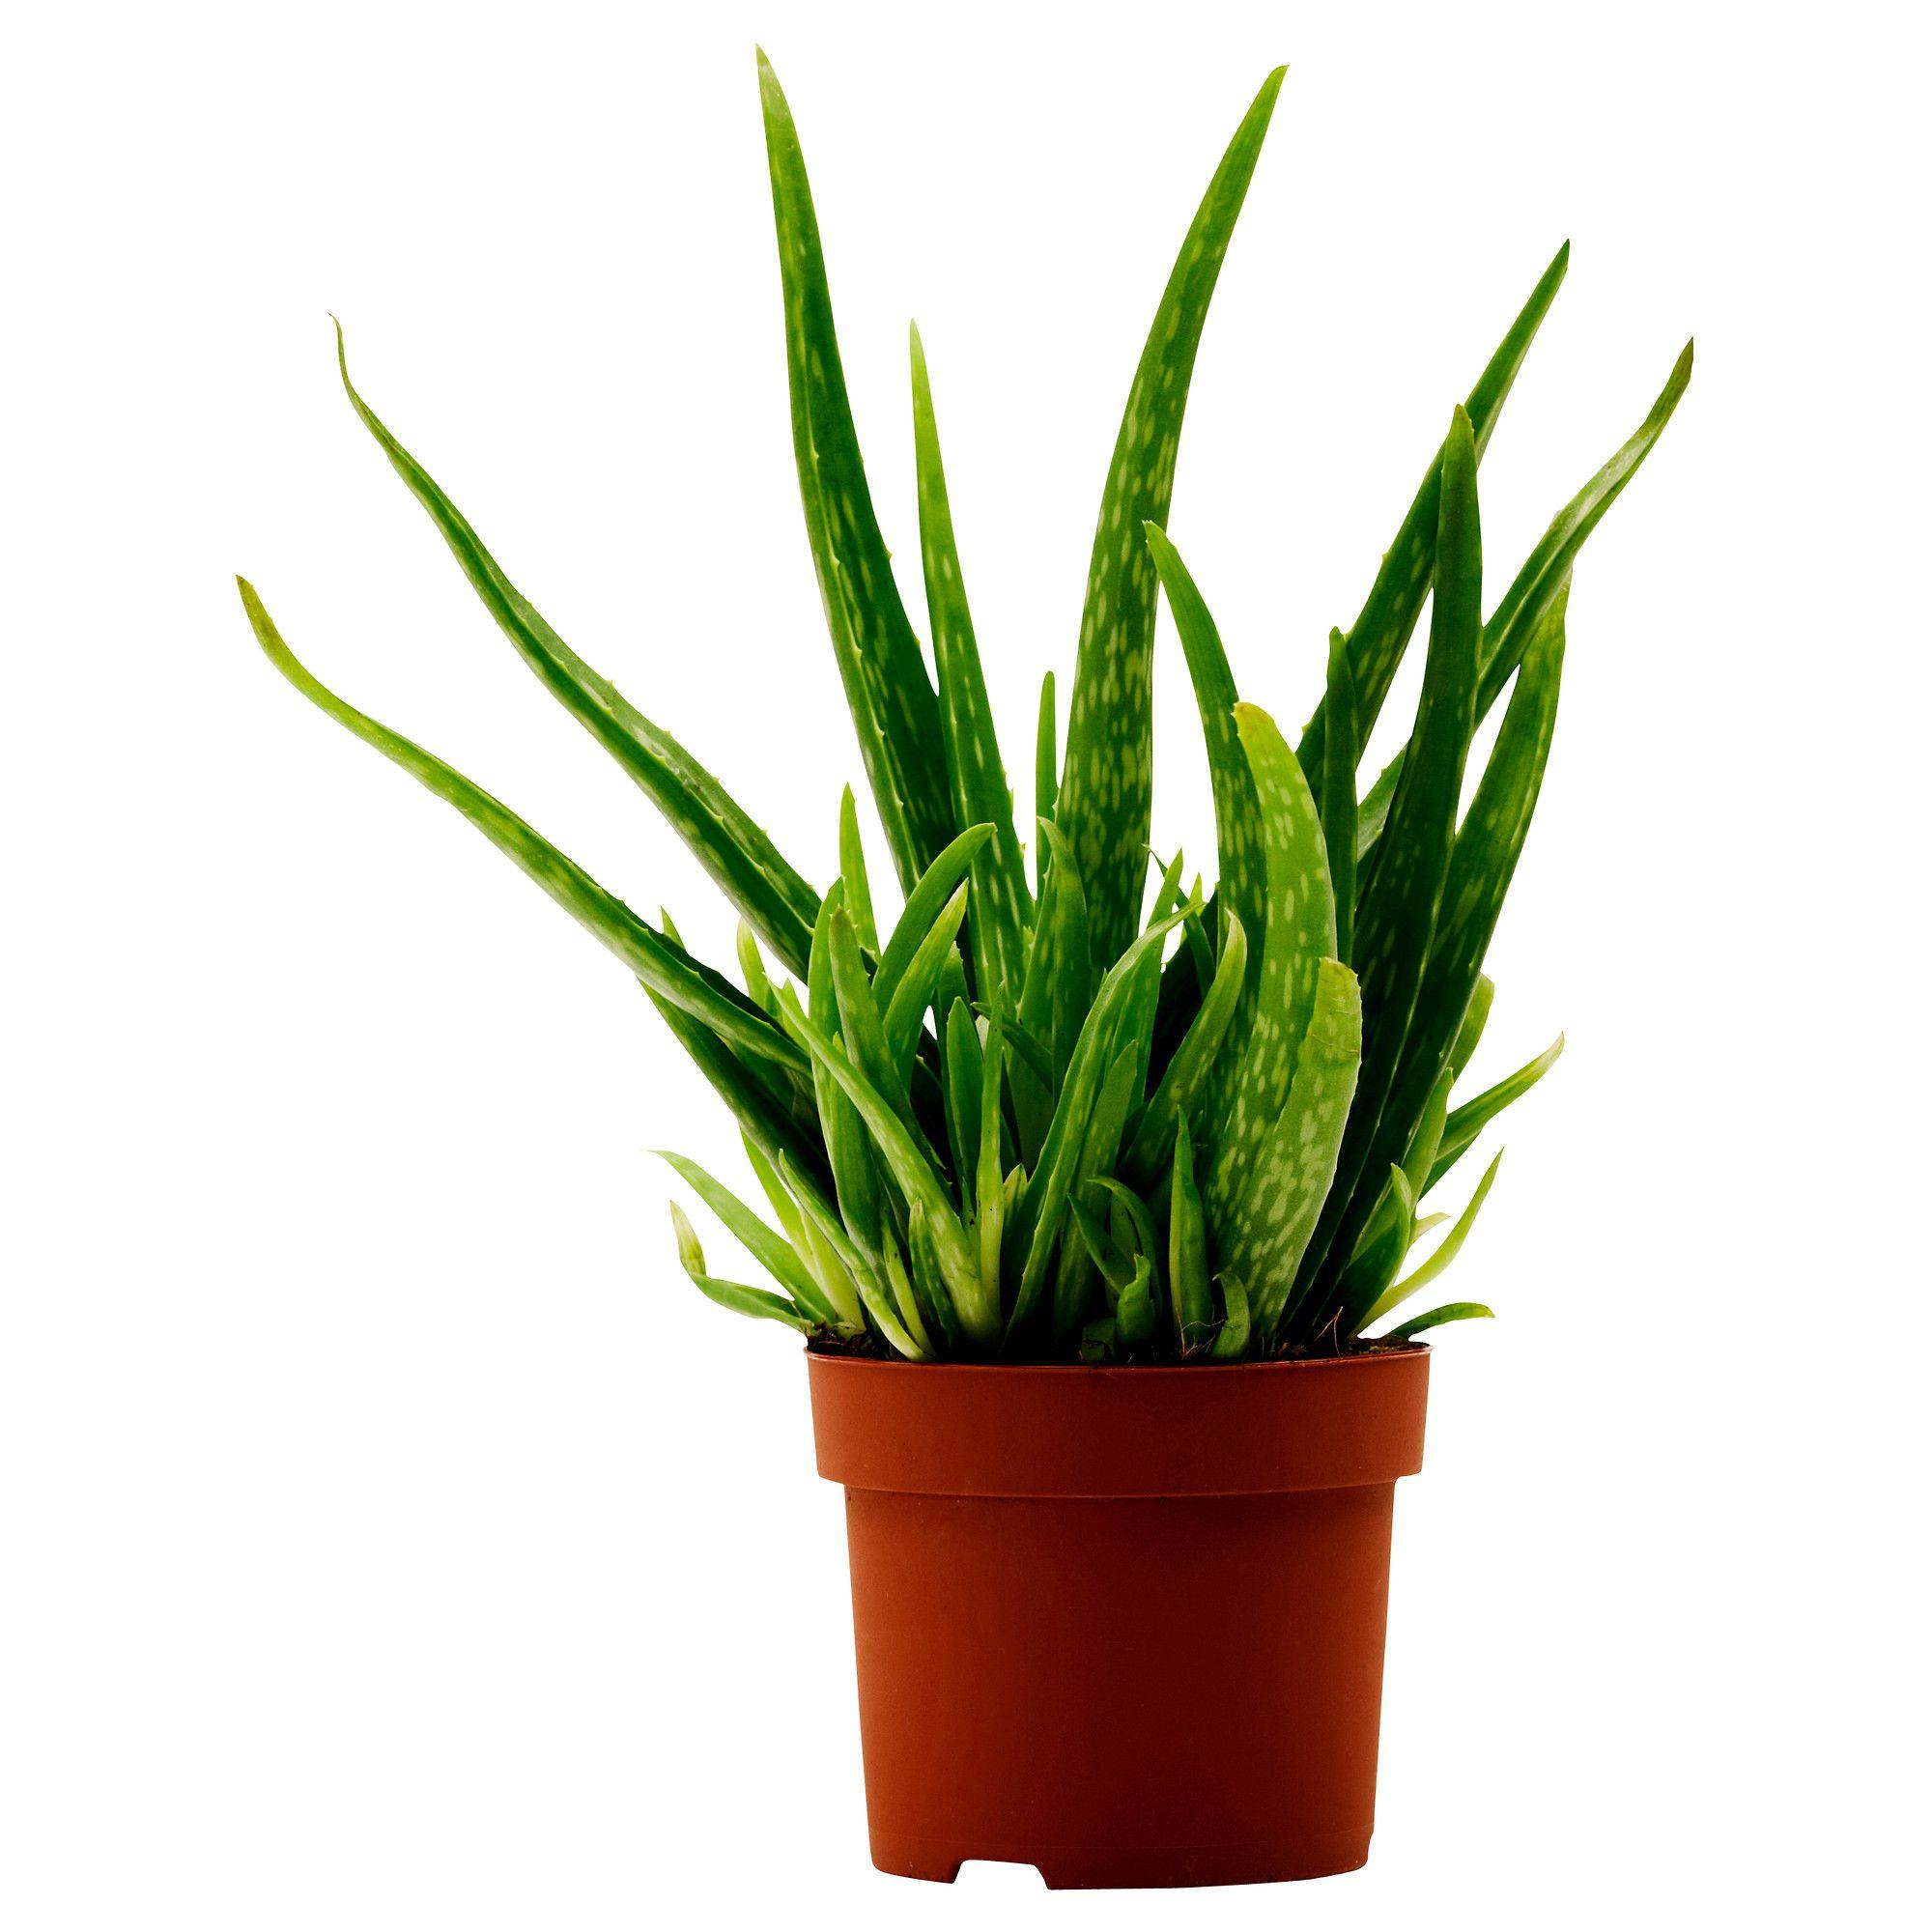 Aloe vera plante en pot ikea plantes fleurs for Plante aloe vera chambre